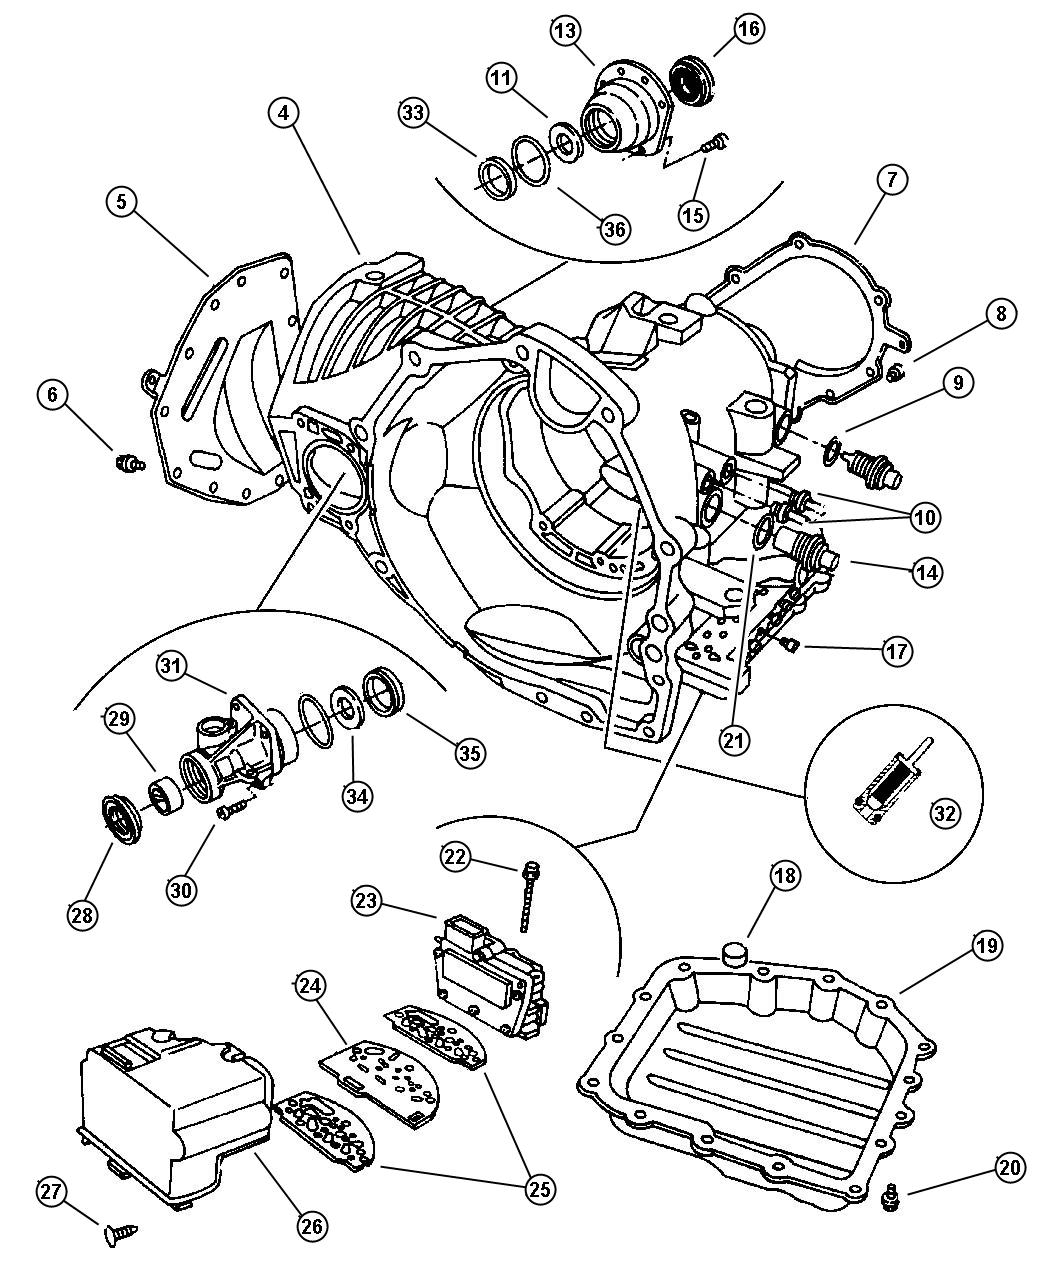 Chrysler Cirrus Gasket. Transmission solenoid. Trans